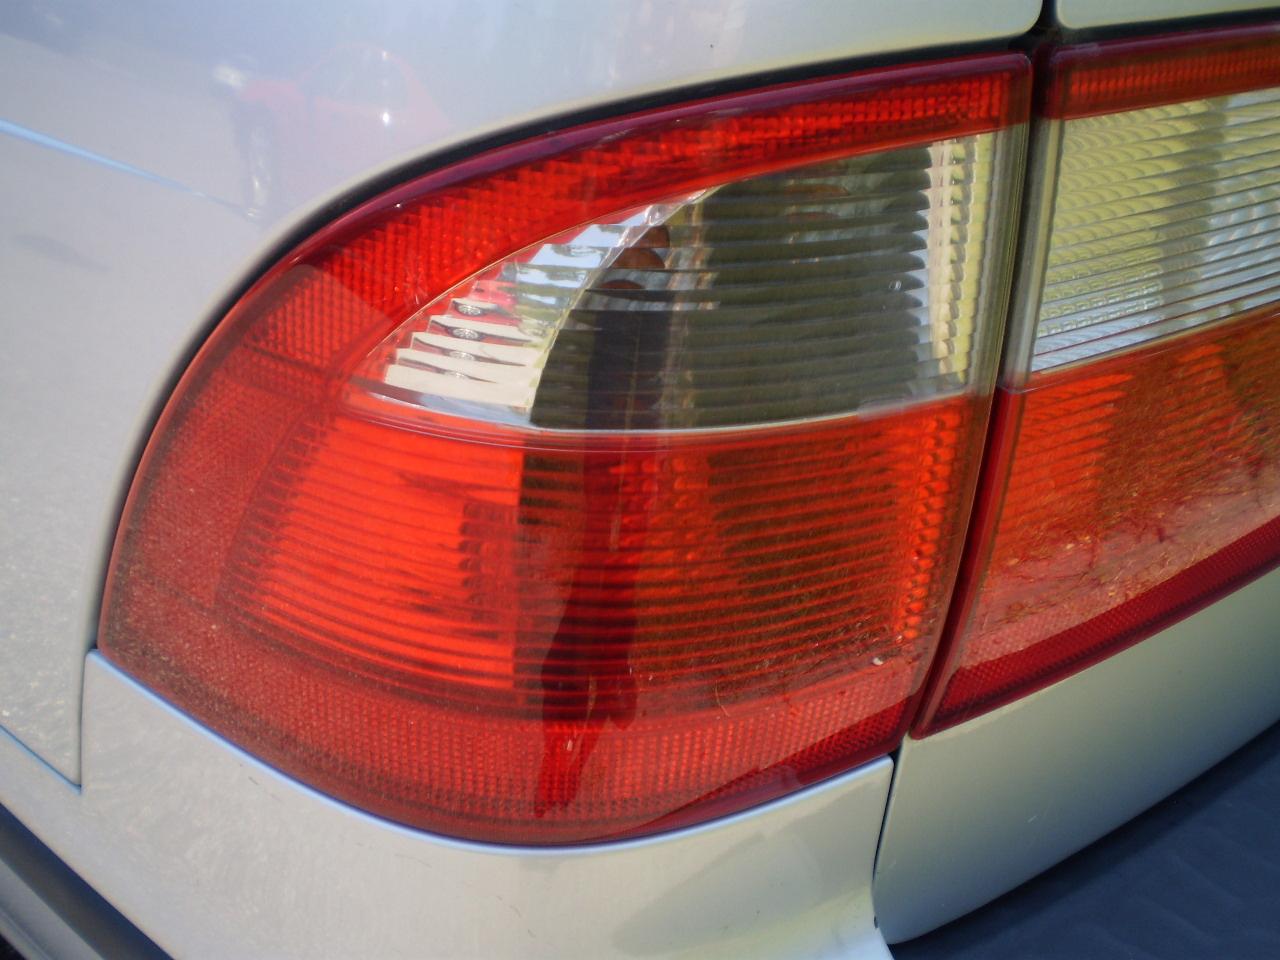 Driver Side Tail Light 2003 SAAB 9-5 Wagon